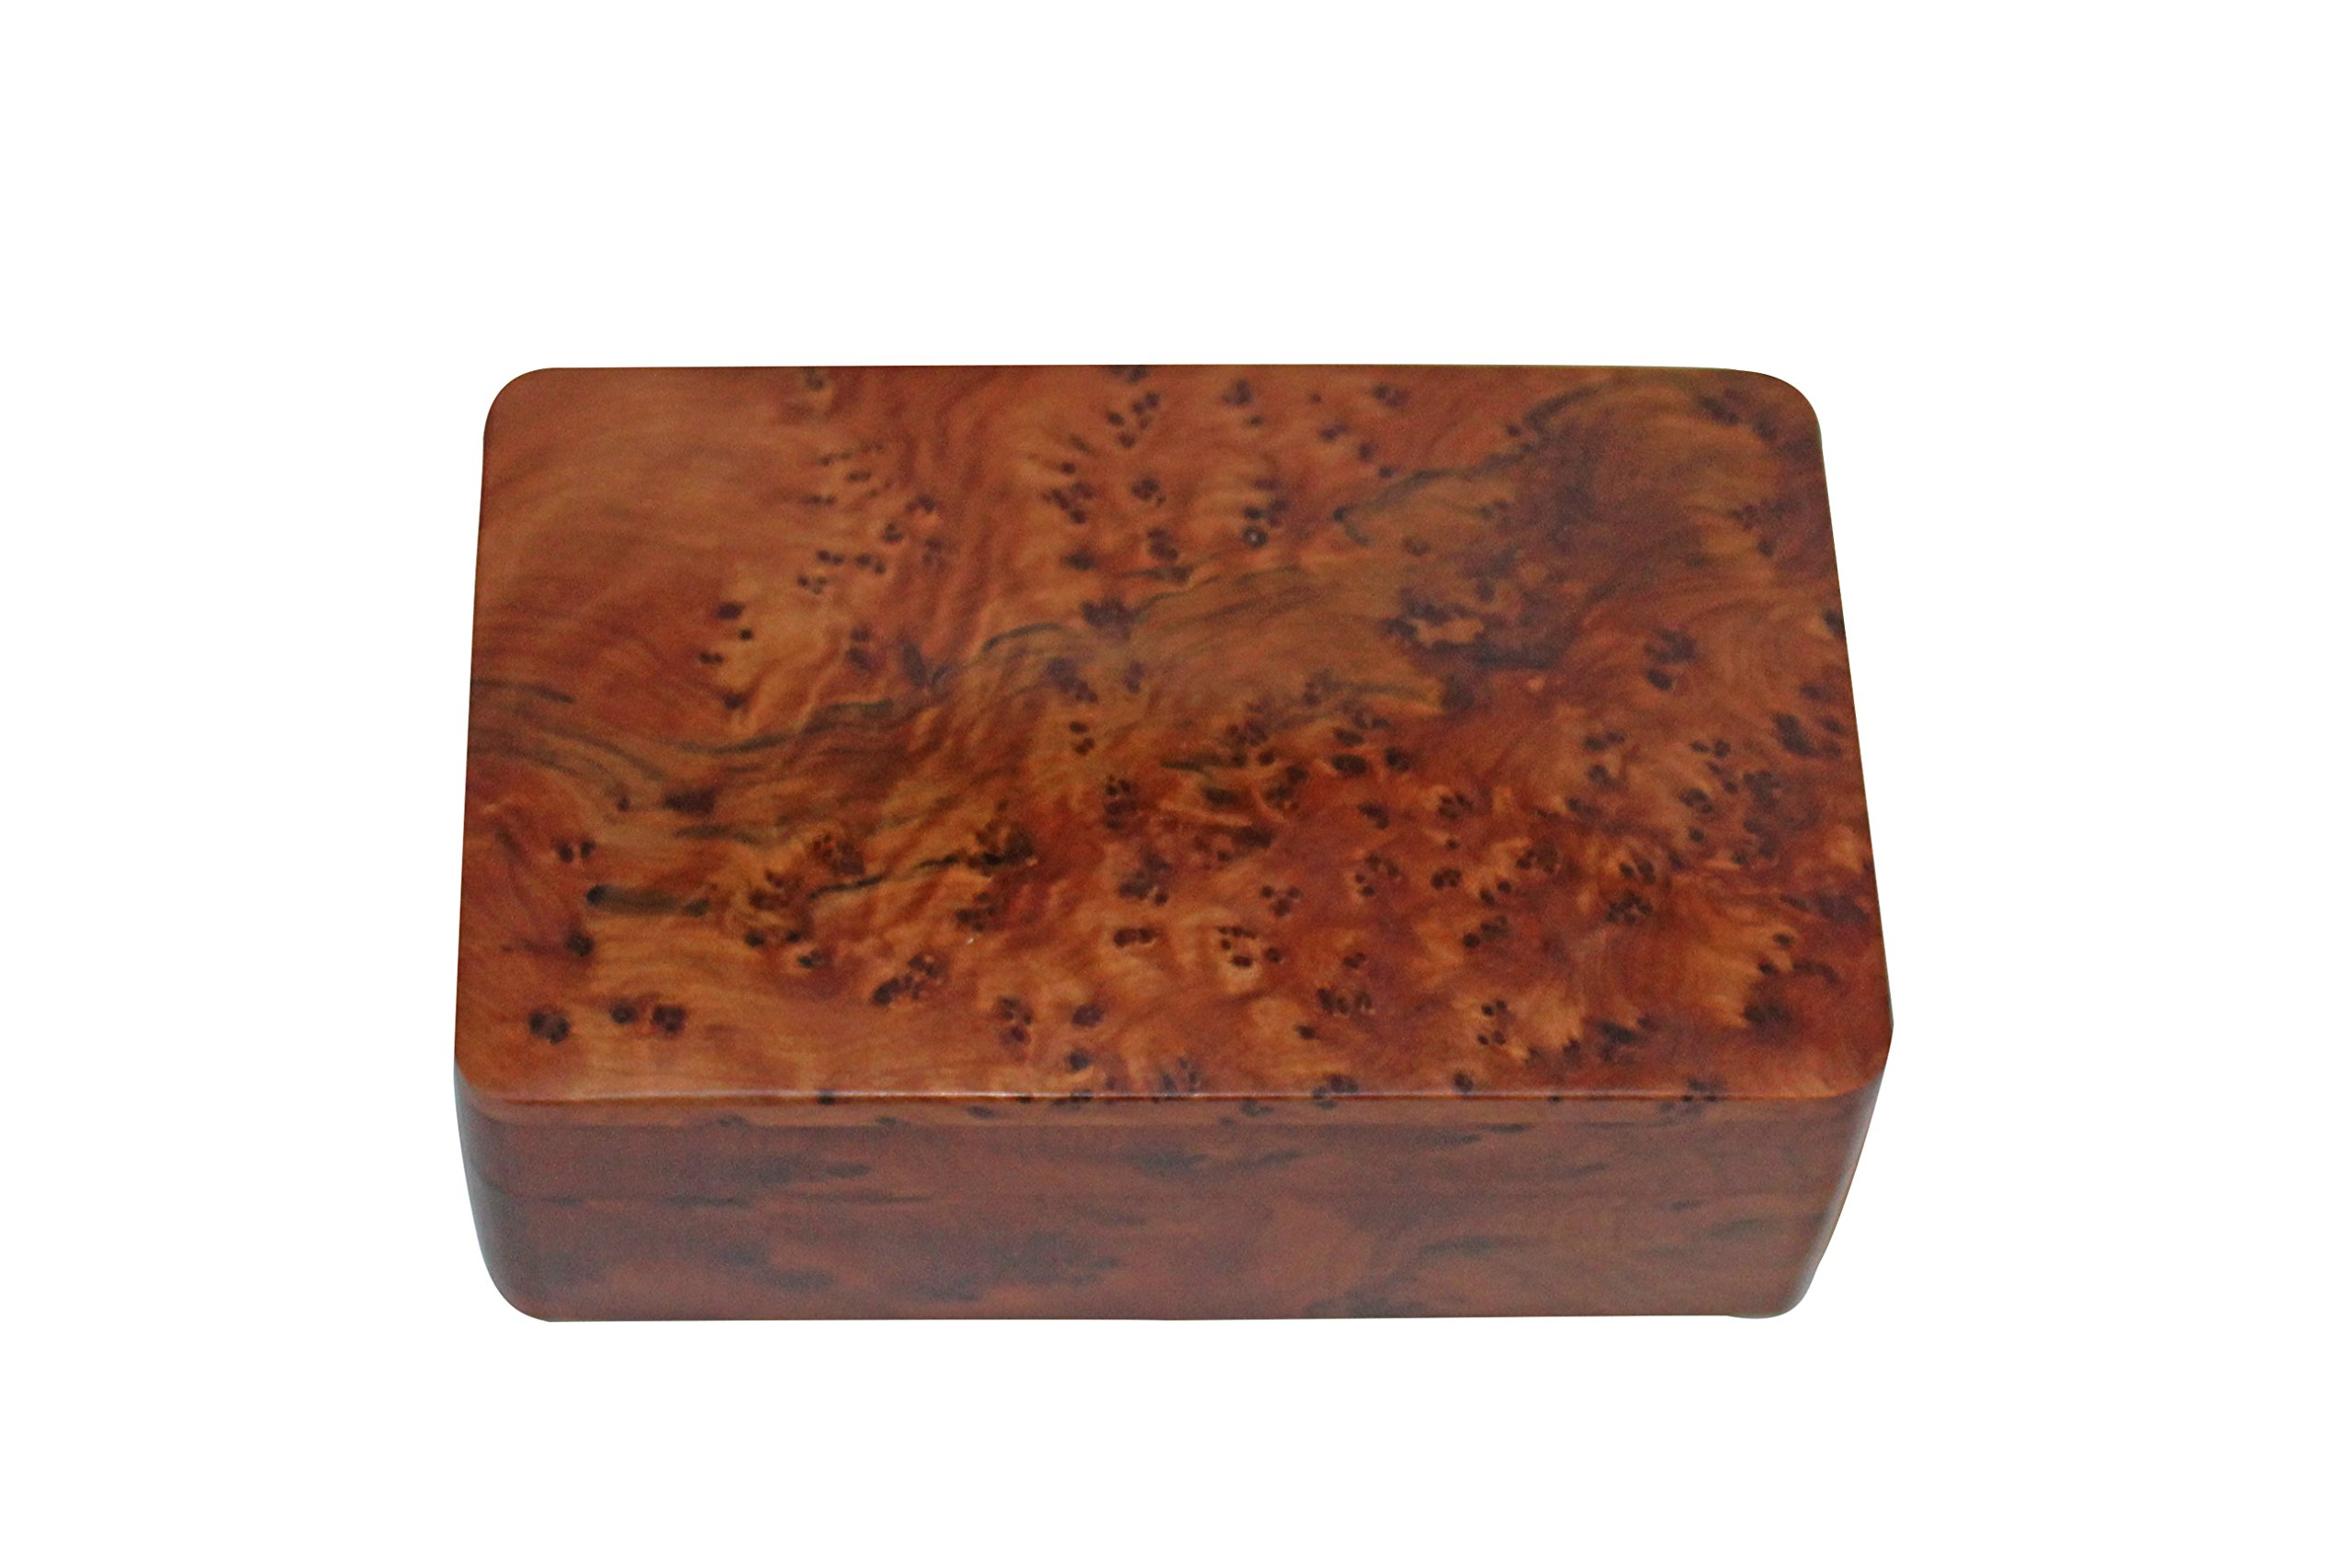 Bazaardi Exotic Hand Carved Wooden Multipurpose Keepsake Jewelry Trinket Box Storage Organize (Medium wood Box)